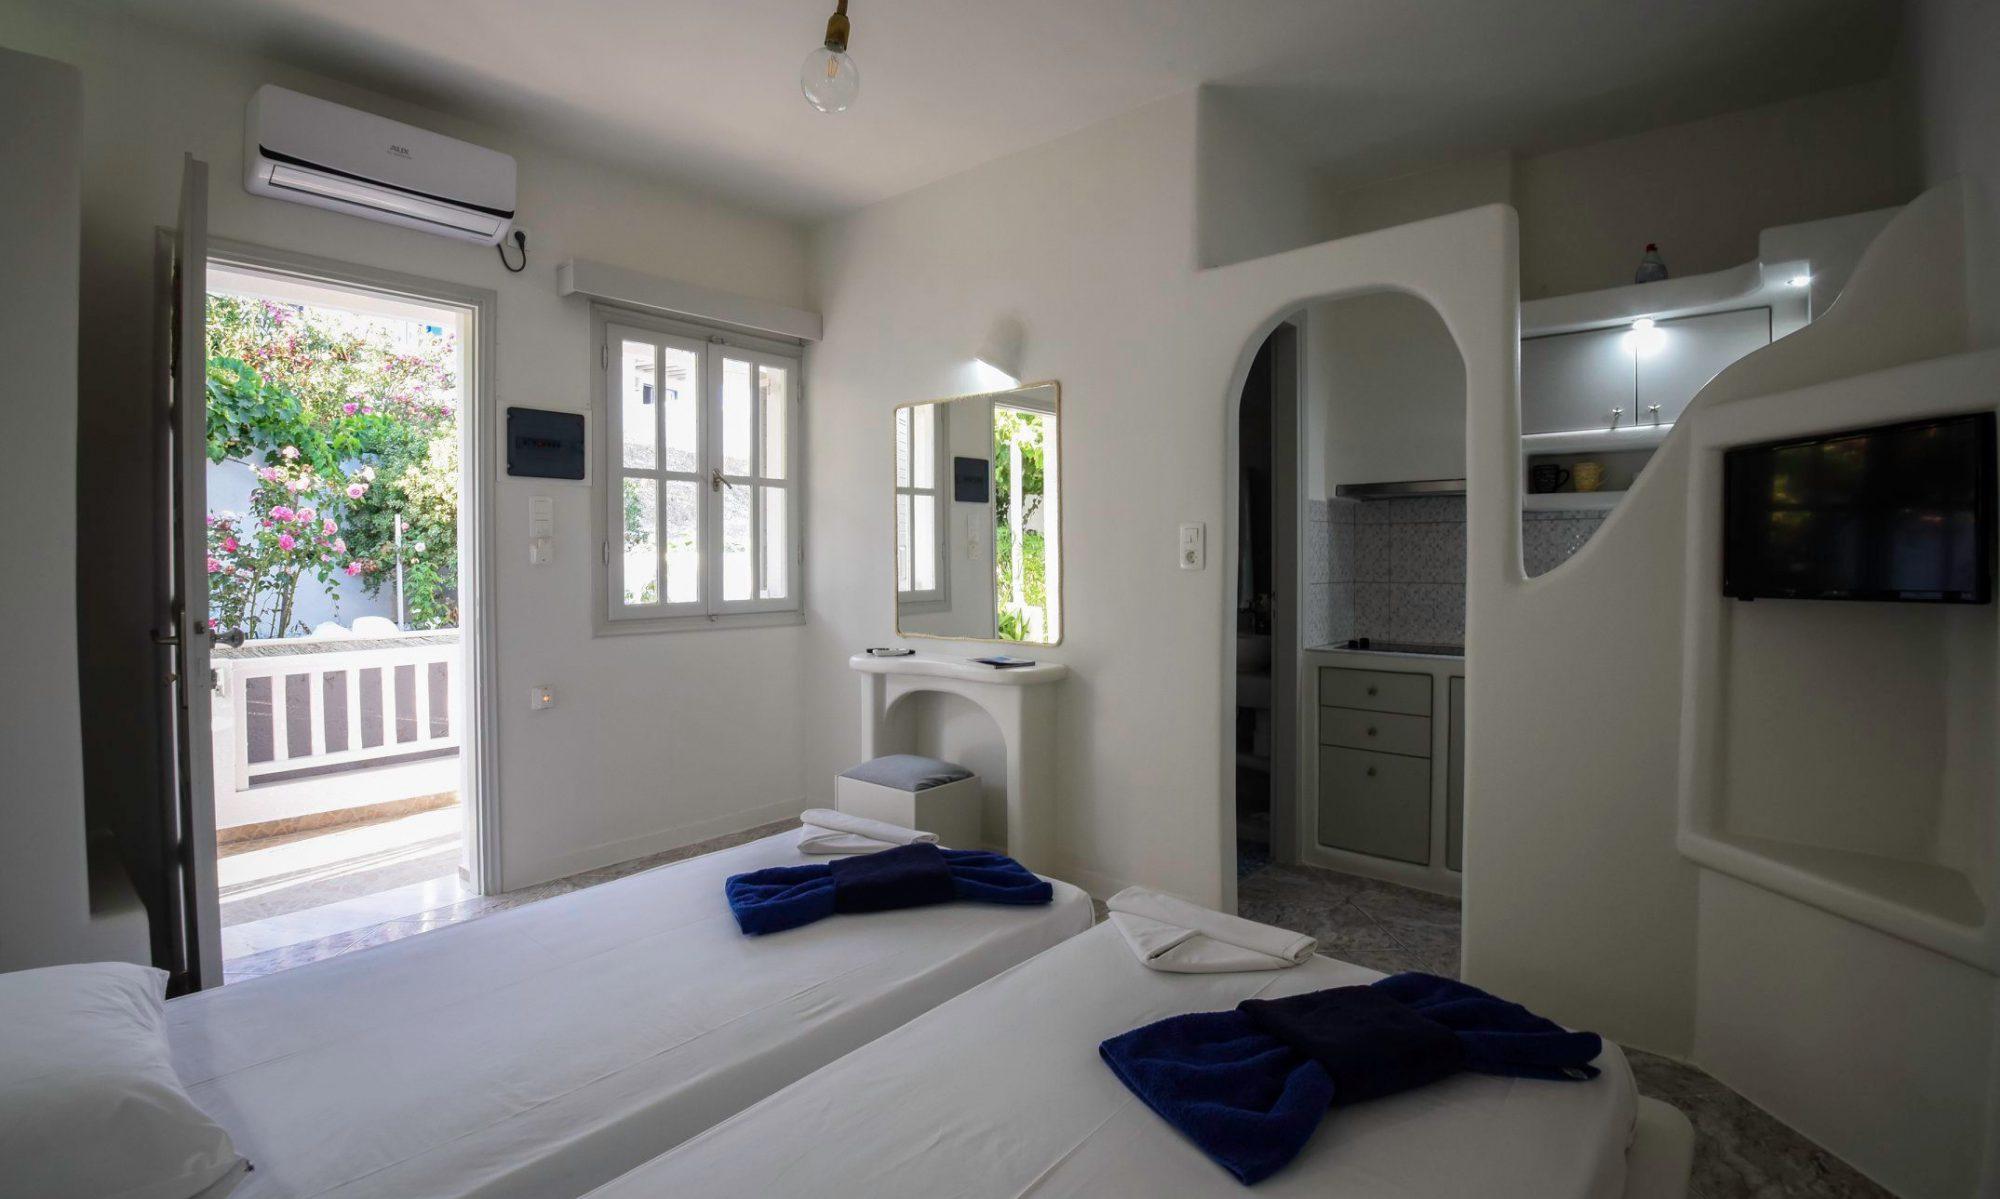 Makrinos Milos Rooms & Studios